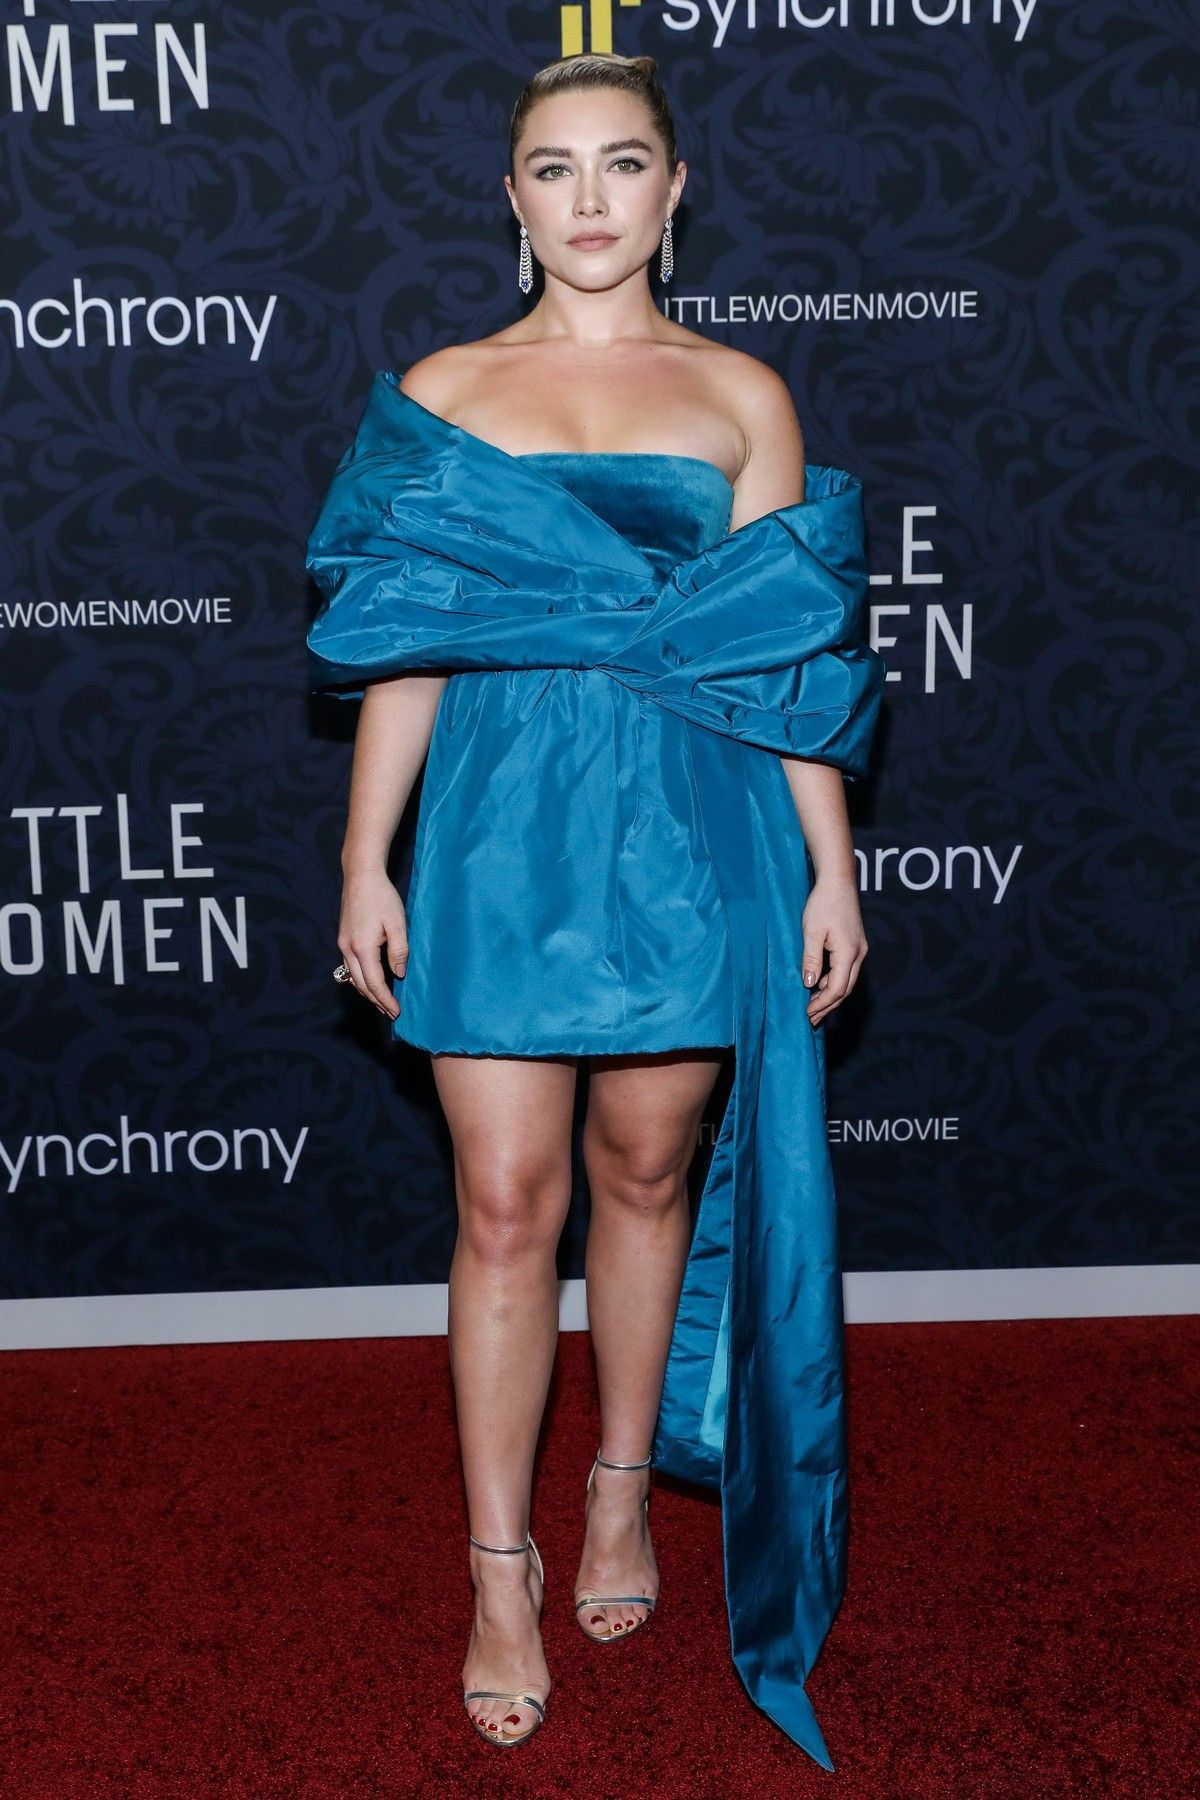 Florence Pugh arrives 'Little Women' Premiere in New York